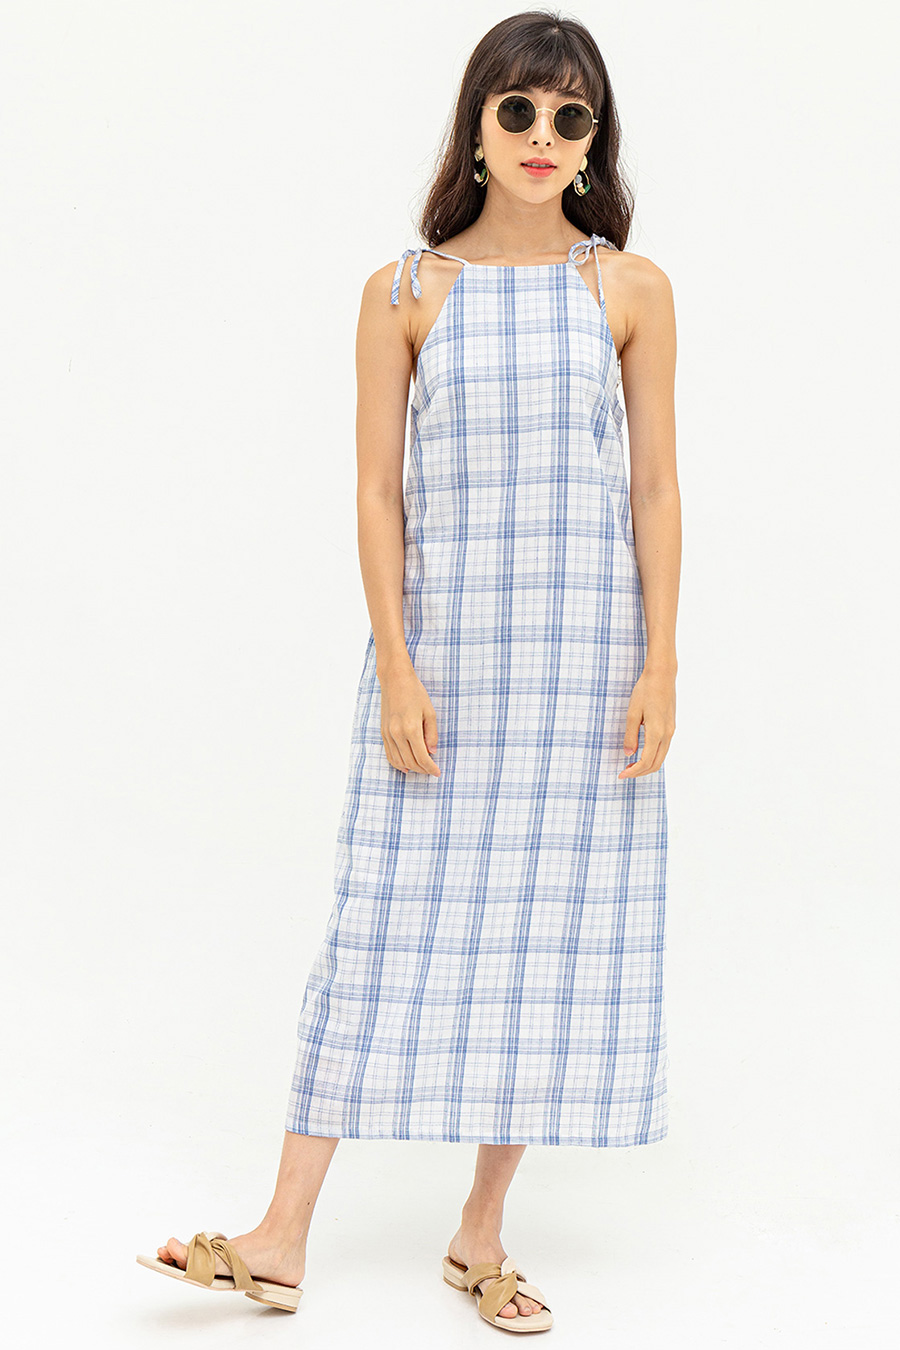 POLONIA DRESS - SERENATA CHECKS [BY MODPARADE]